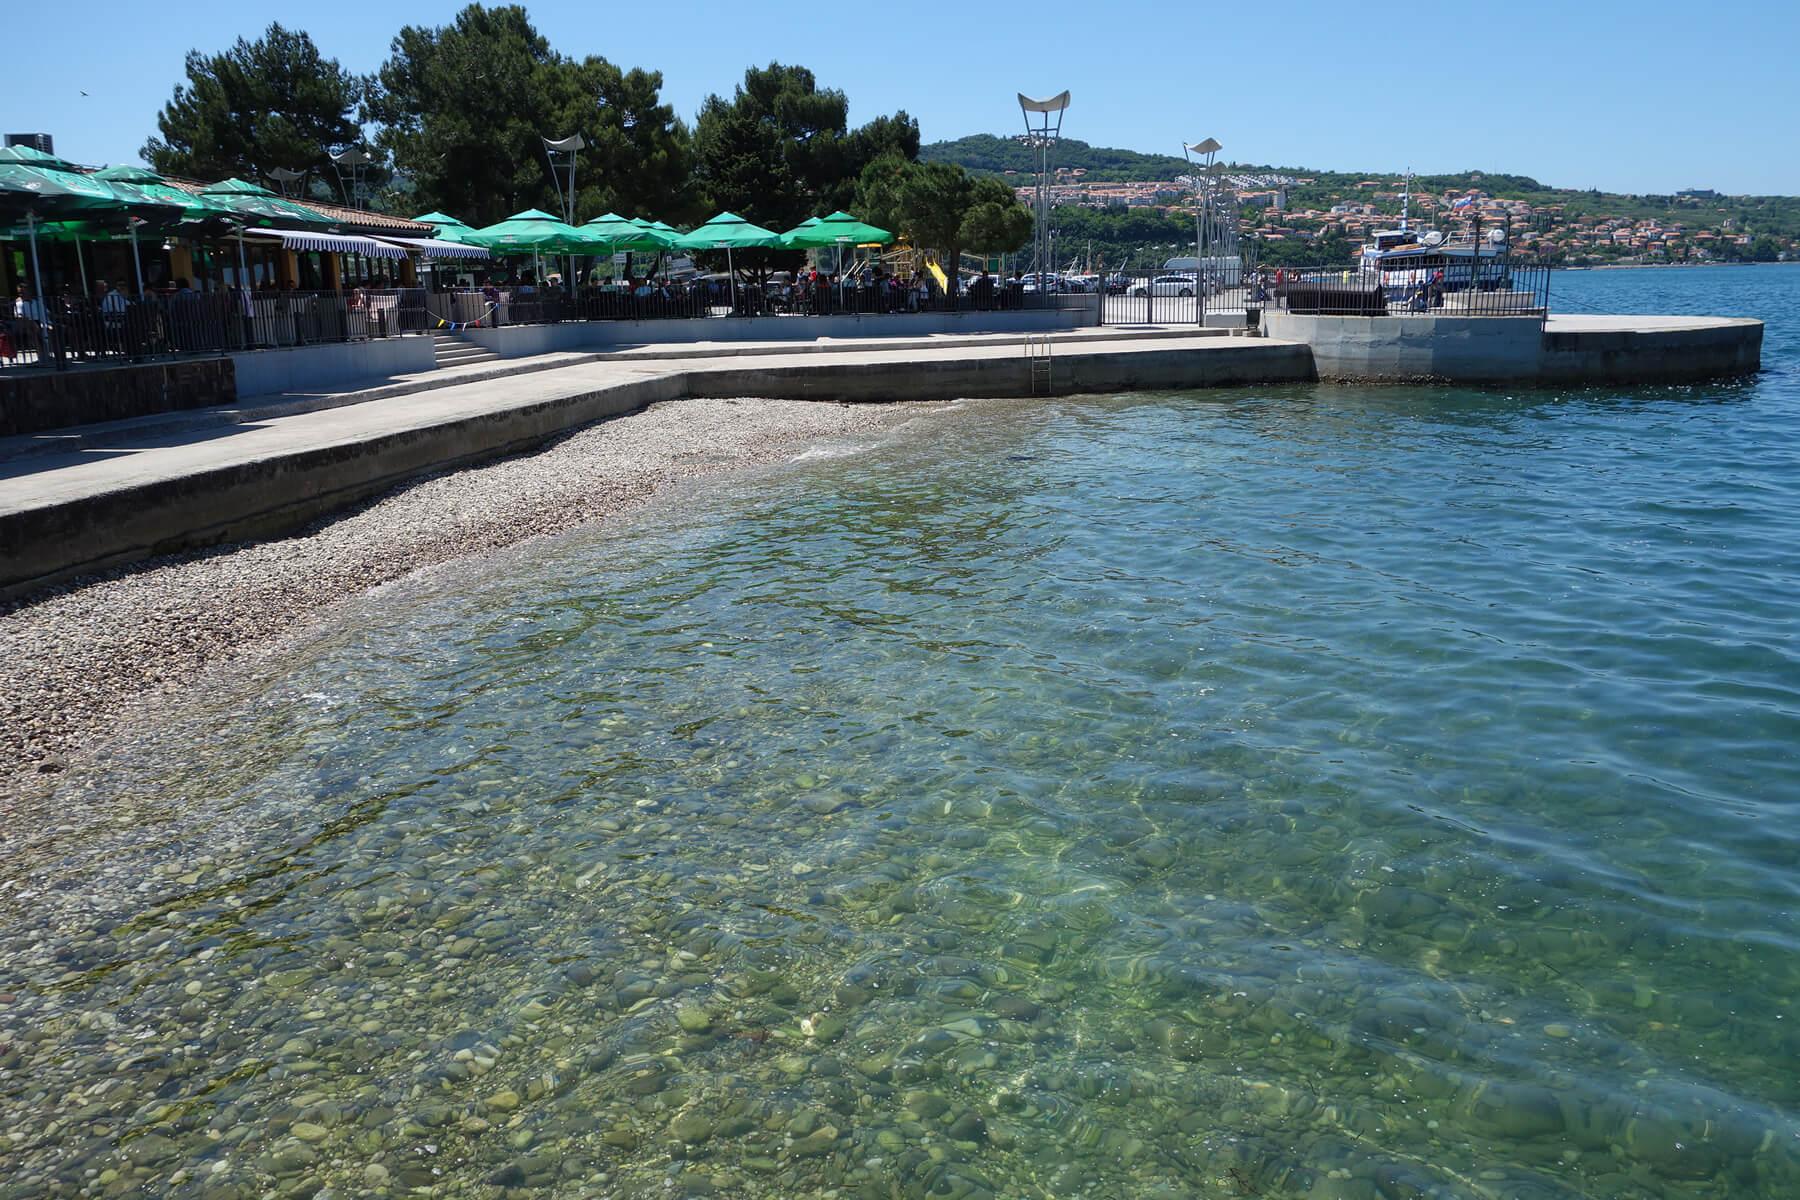 Центральный пляж Копера